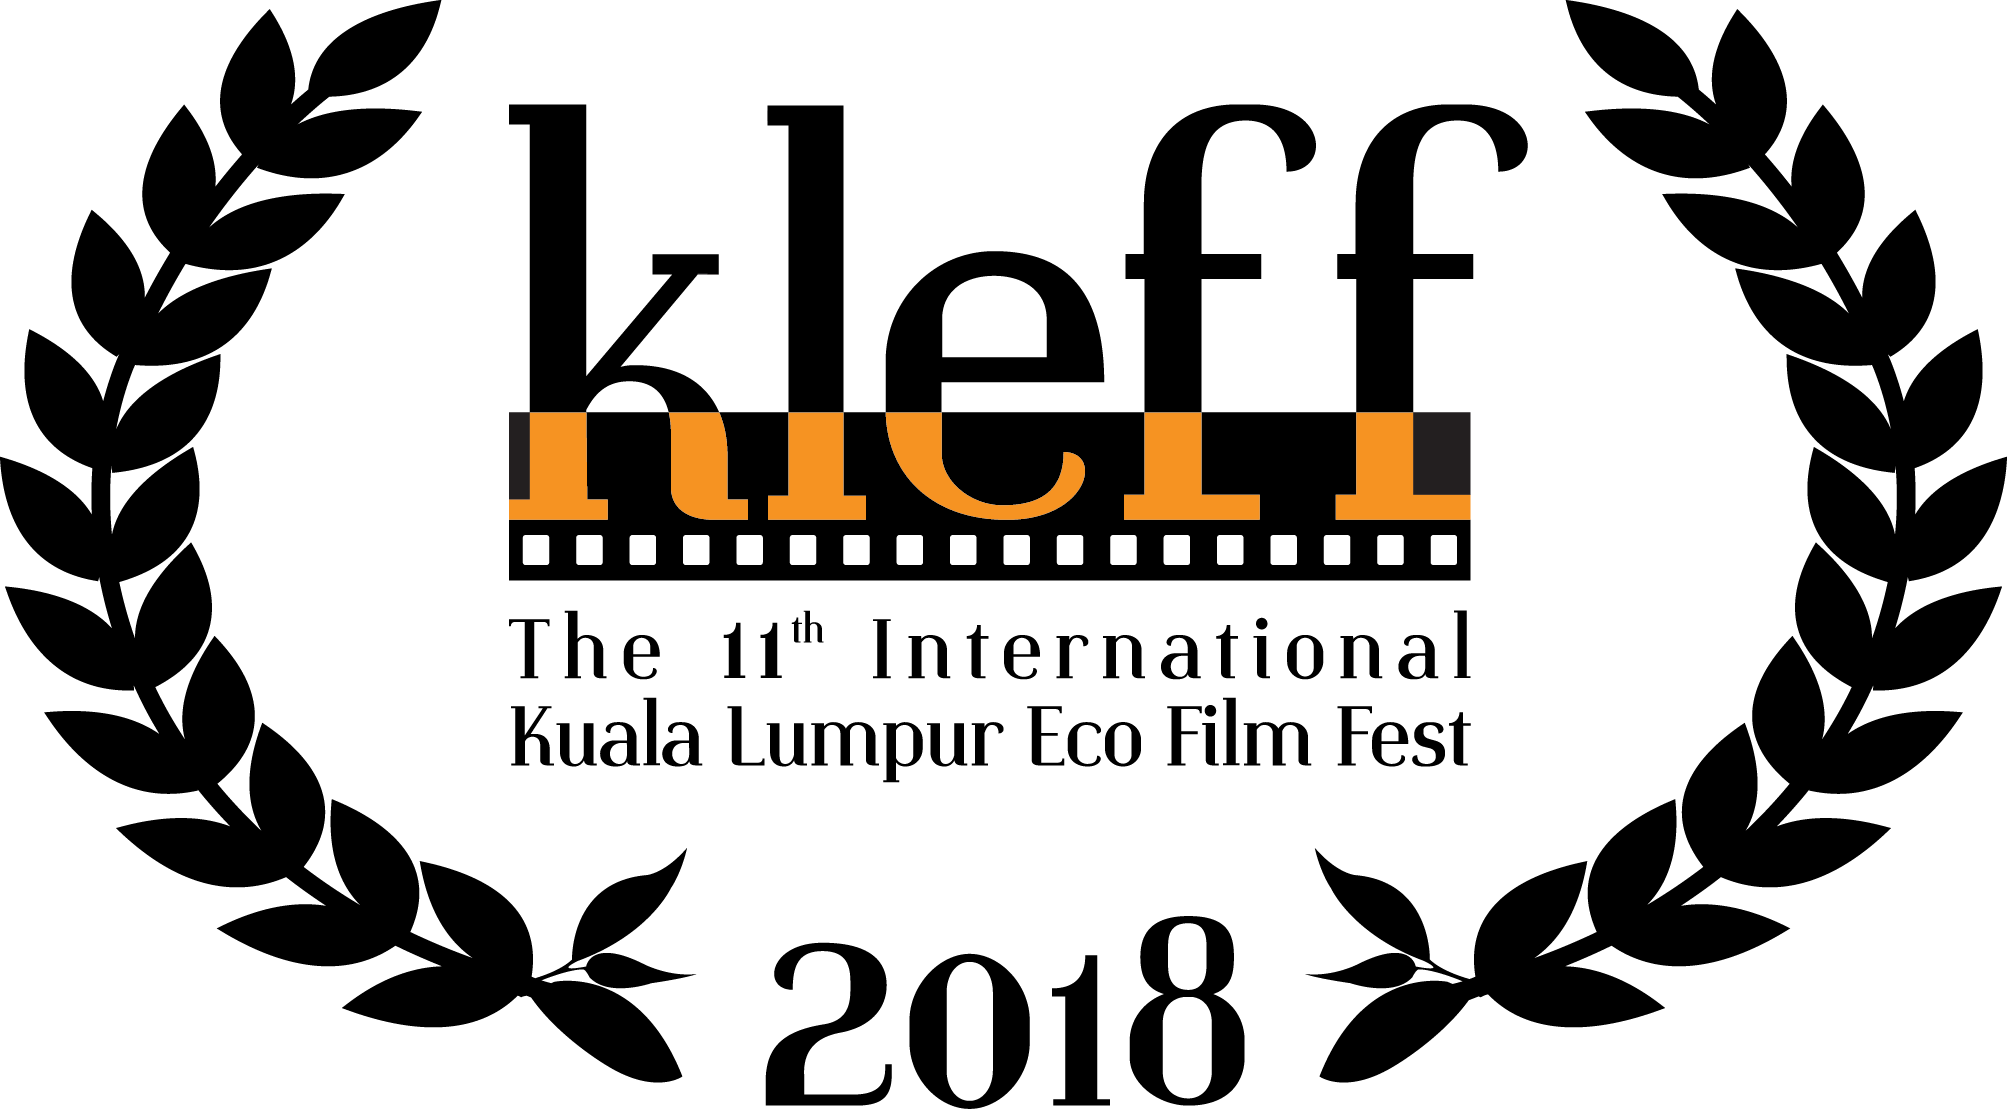 KLEFF2018 Laurels_Black.png